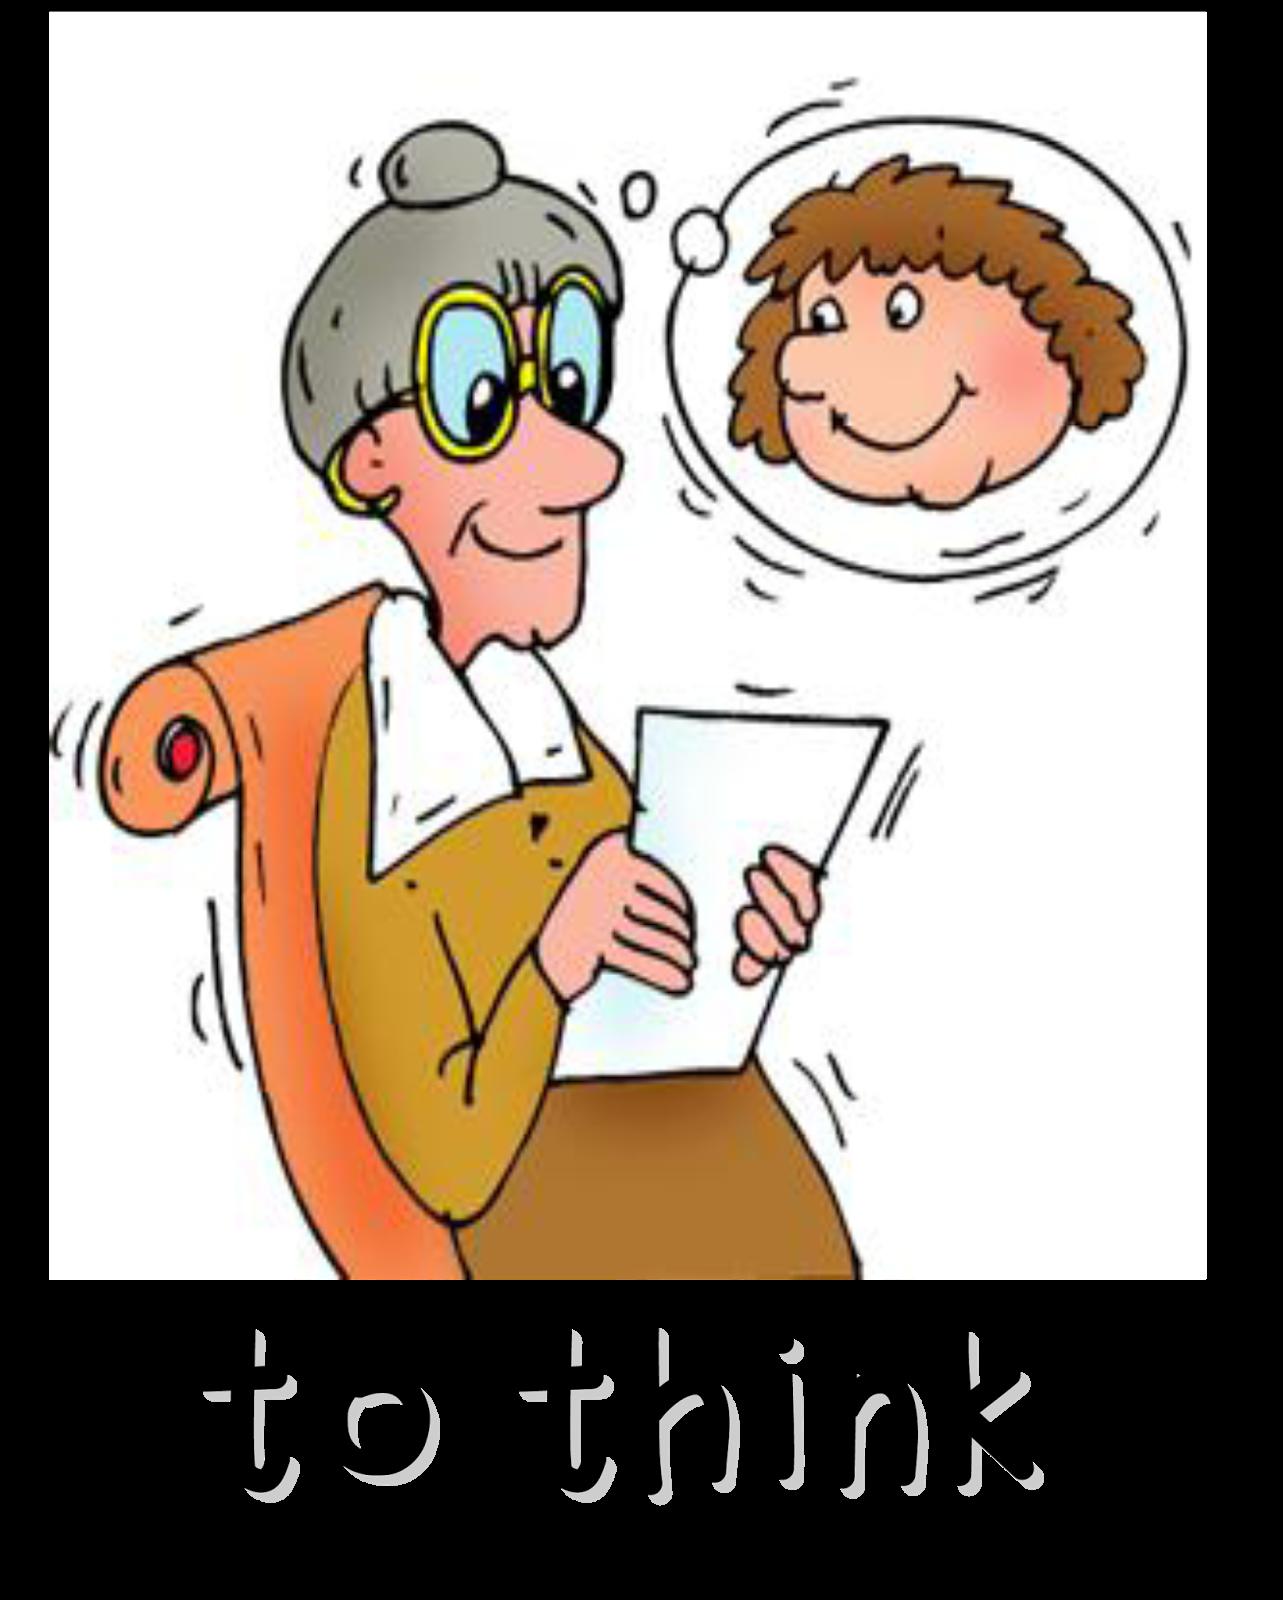 Free Verbs Cliparts, Download Free Clip Art, Free Clip Art.